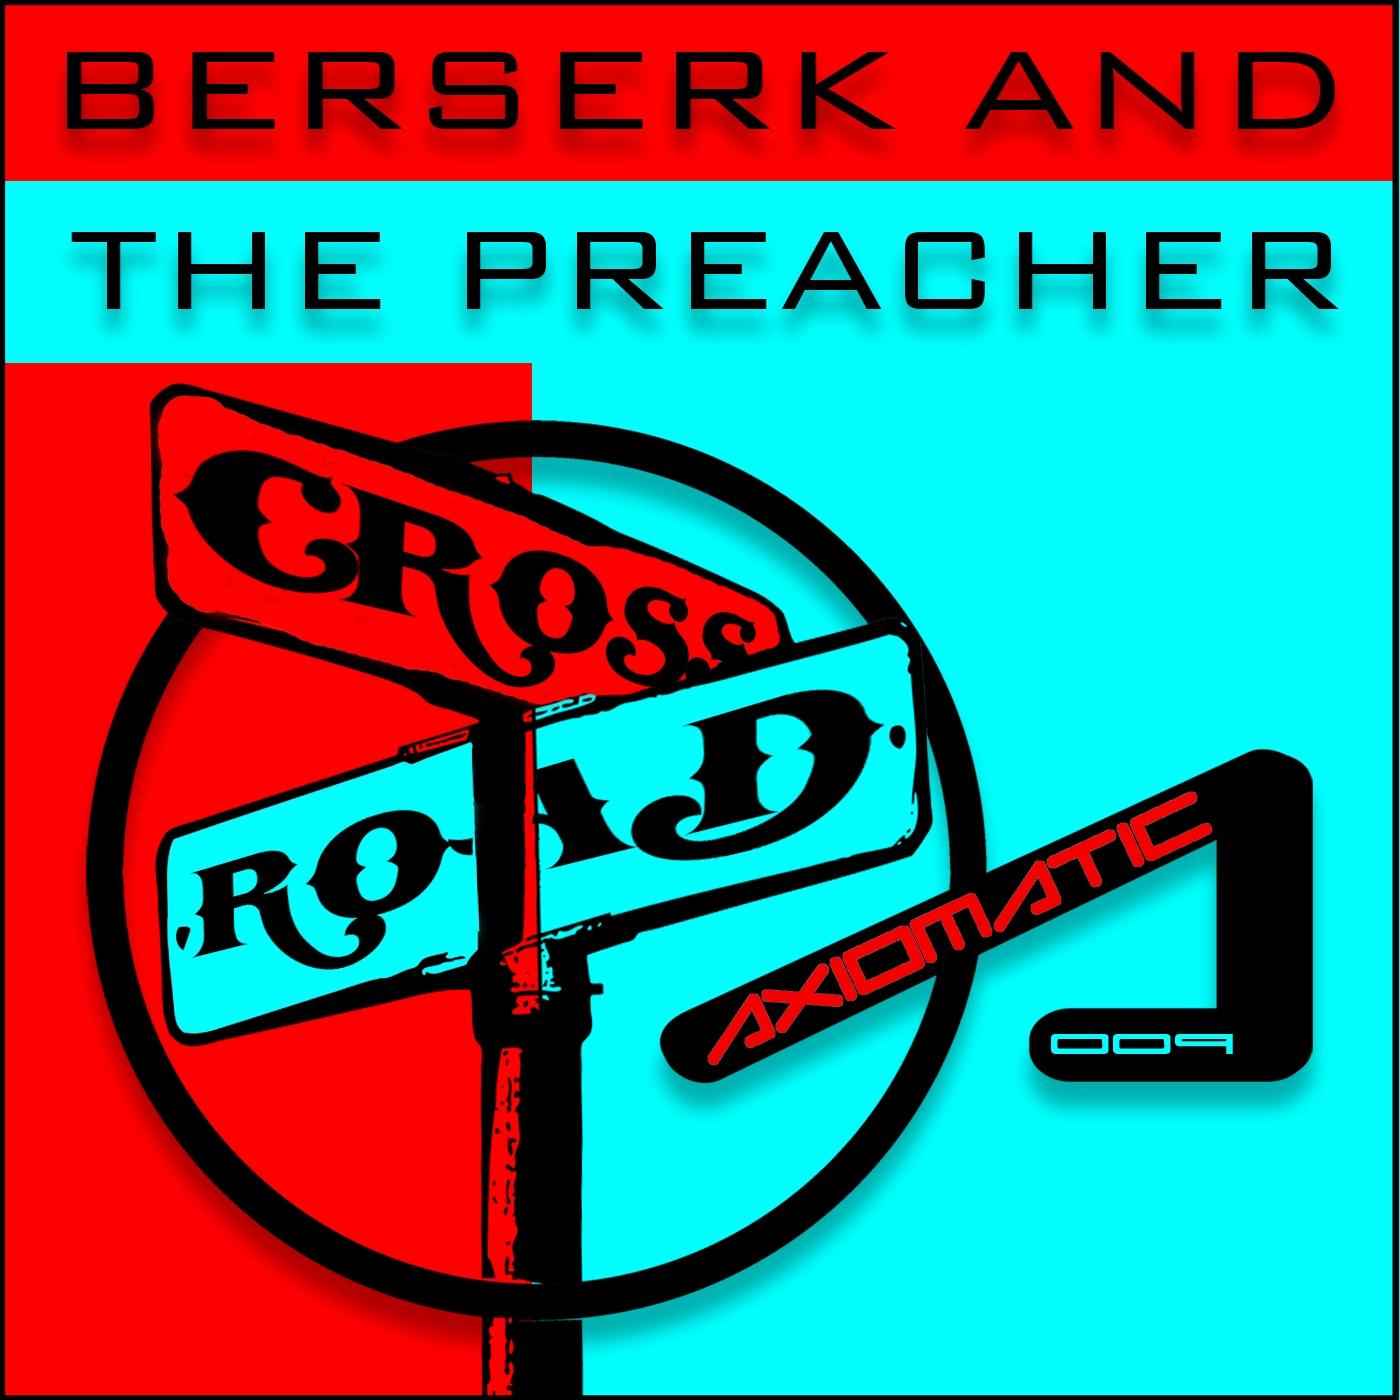 Berserk & The Preacher - Bordermind Traveler (Original mix)